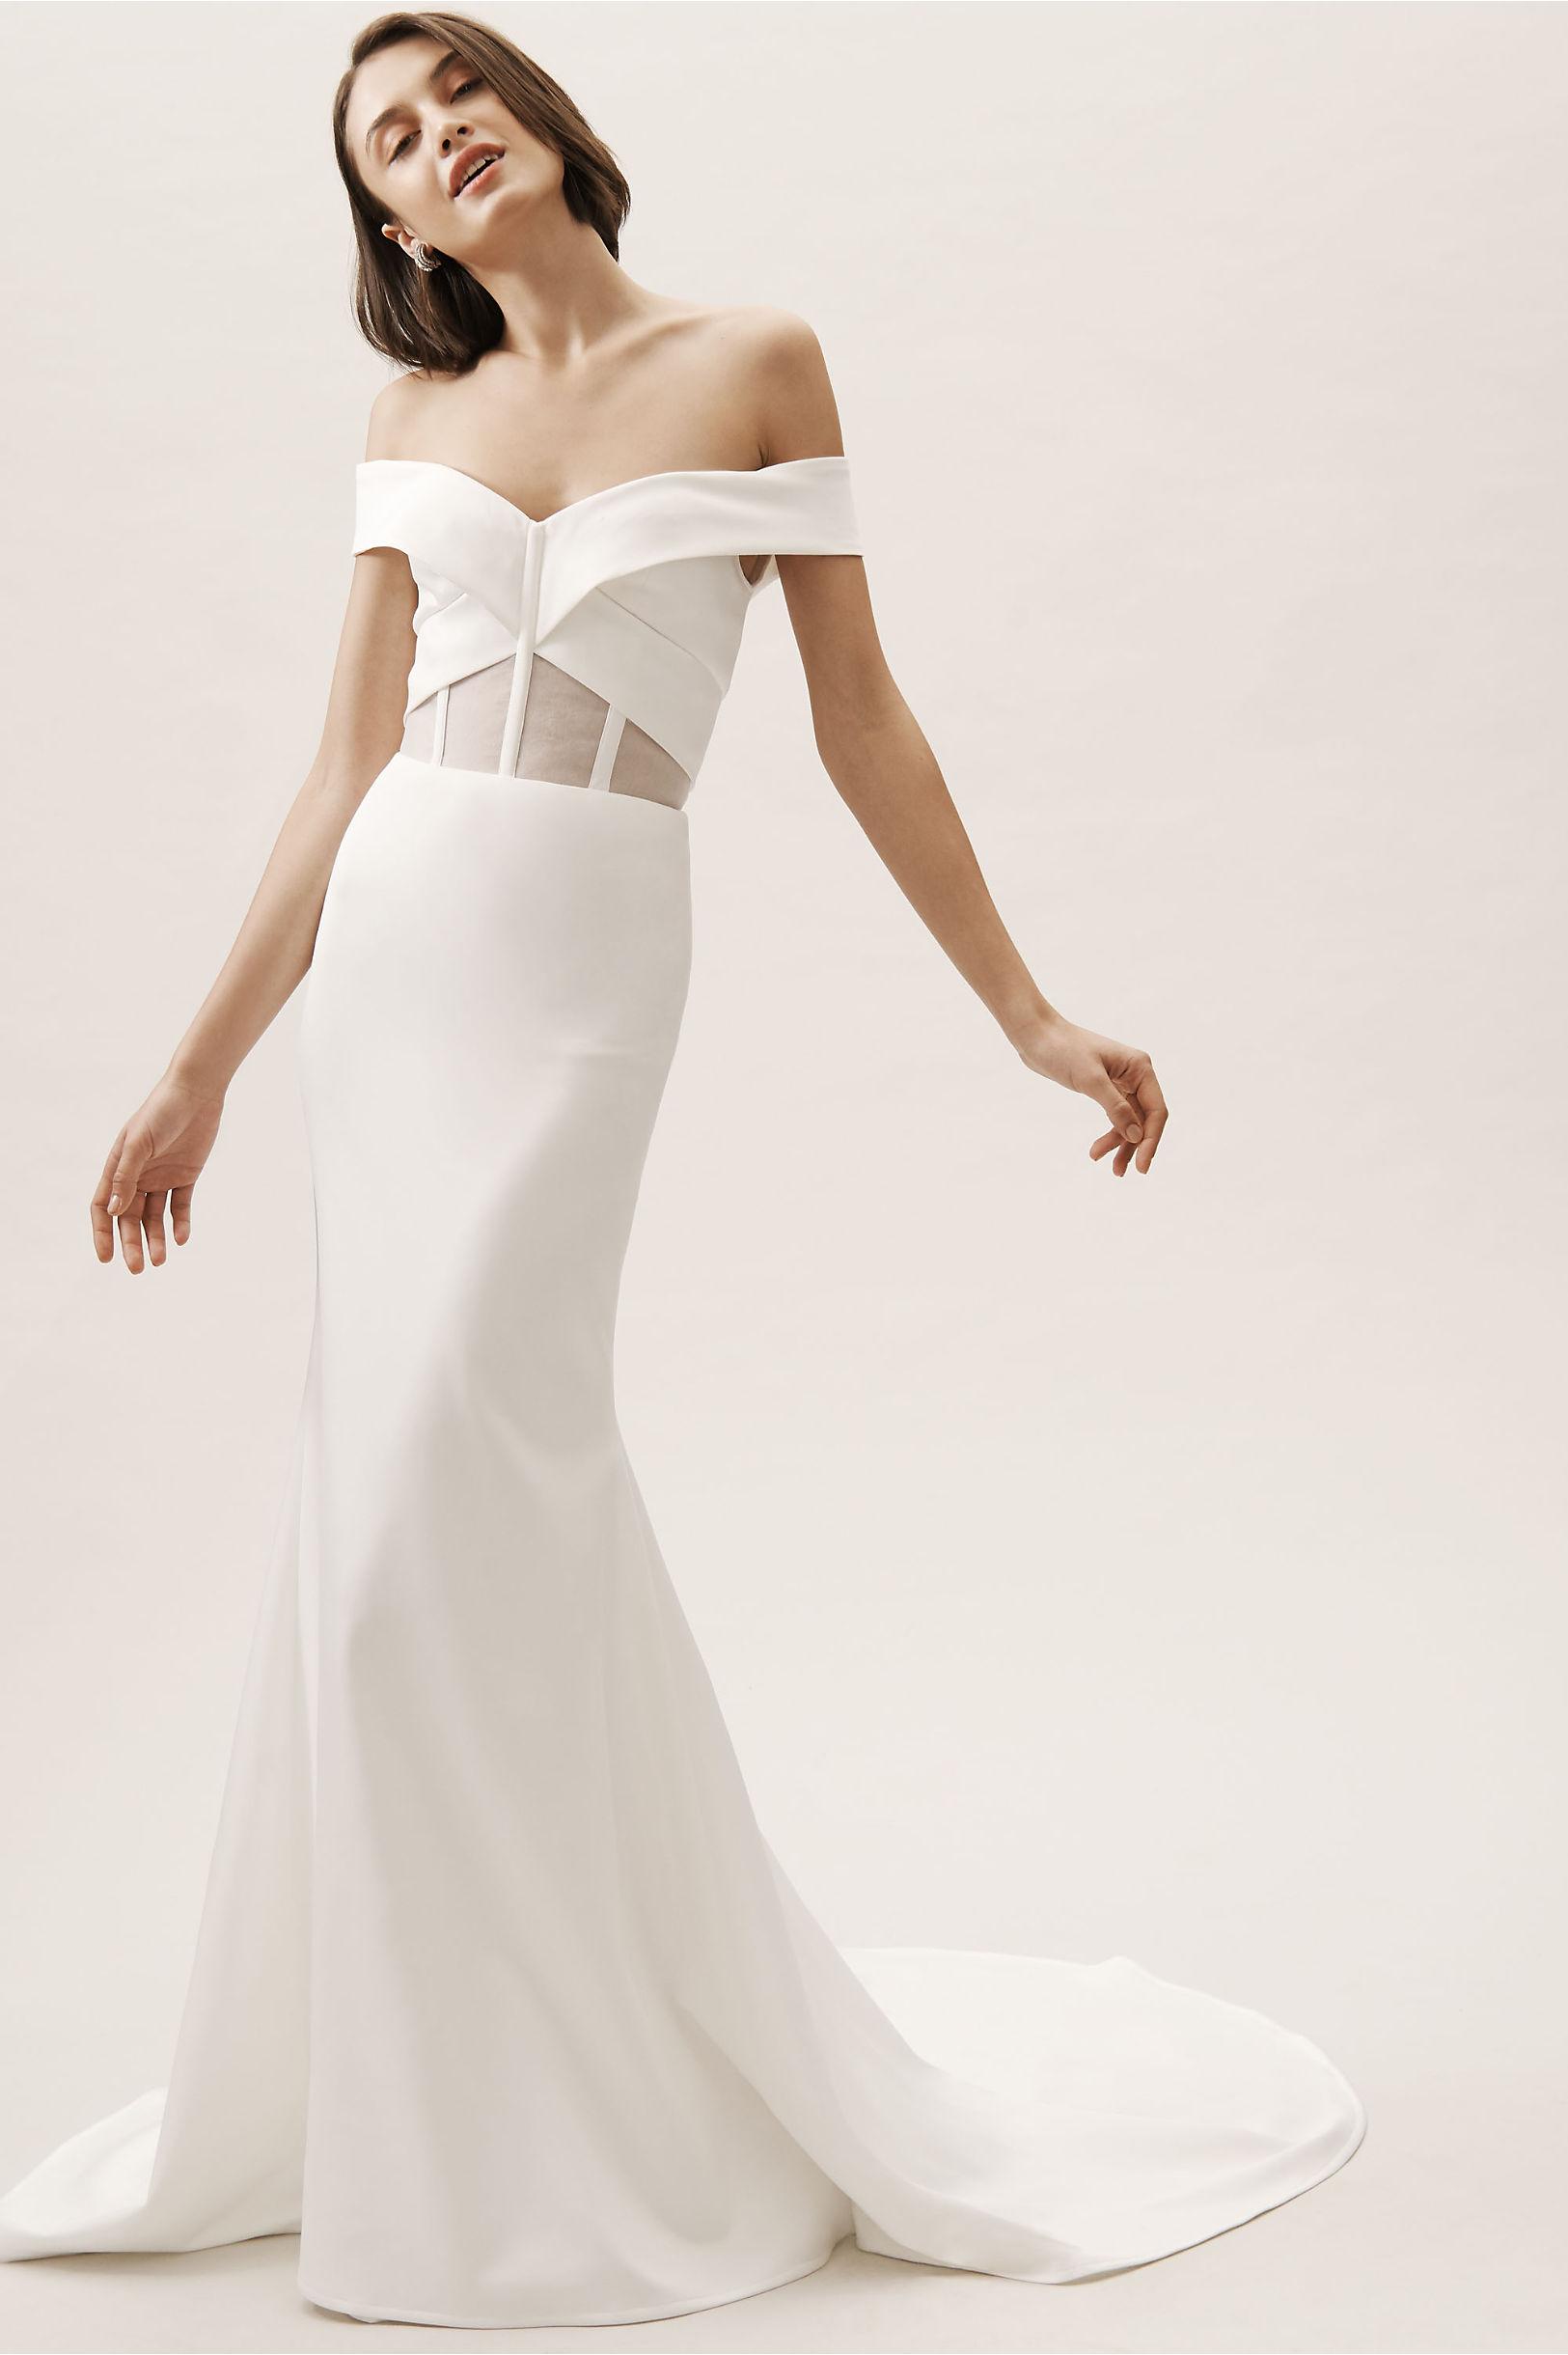 Hamilton Gown Ivory in Bride | BHLDN